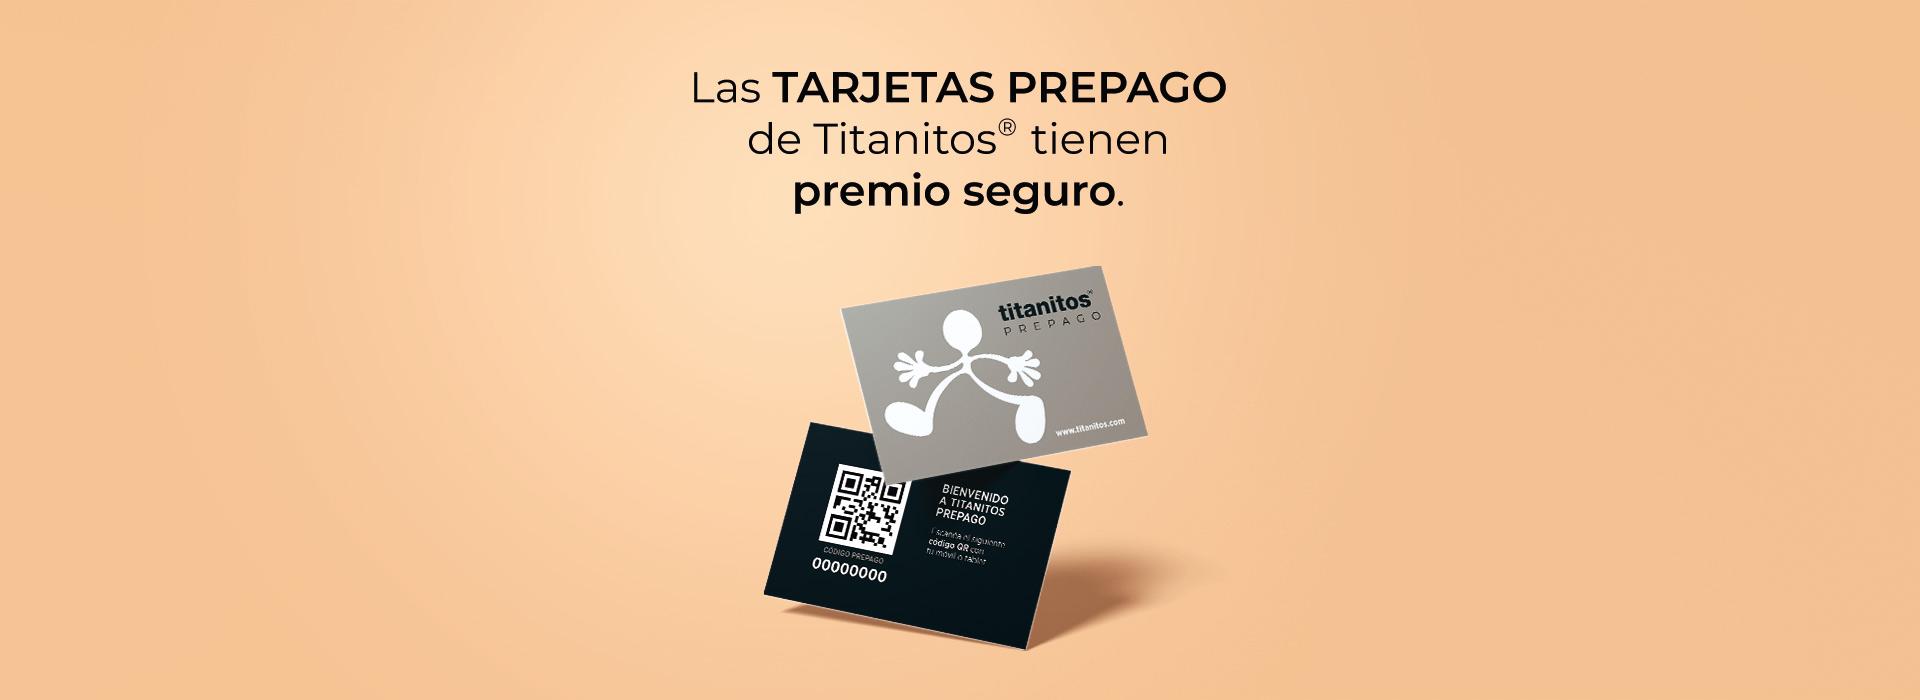 titanitos-image